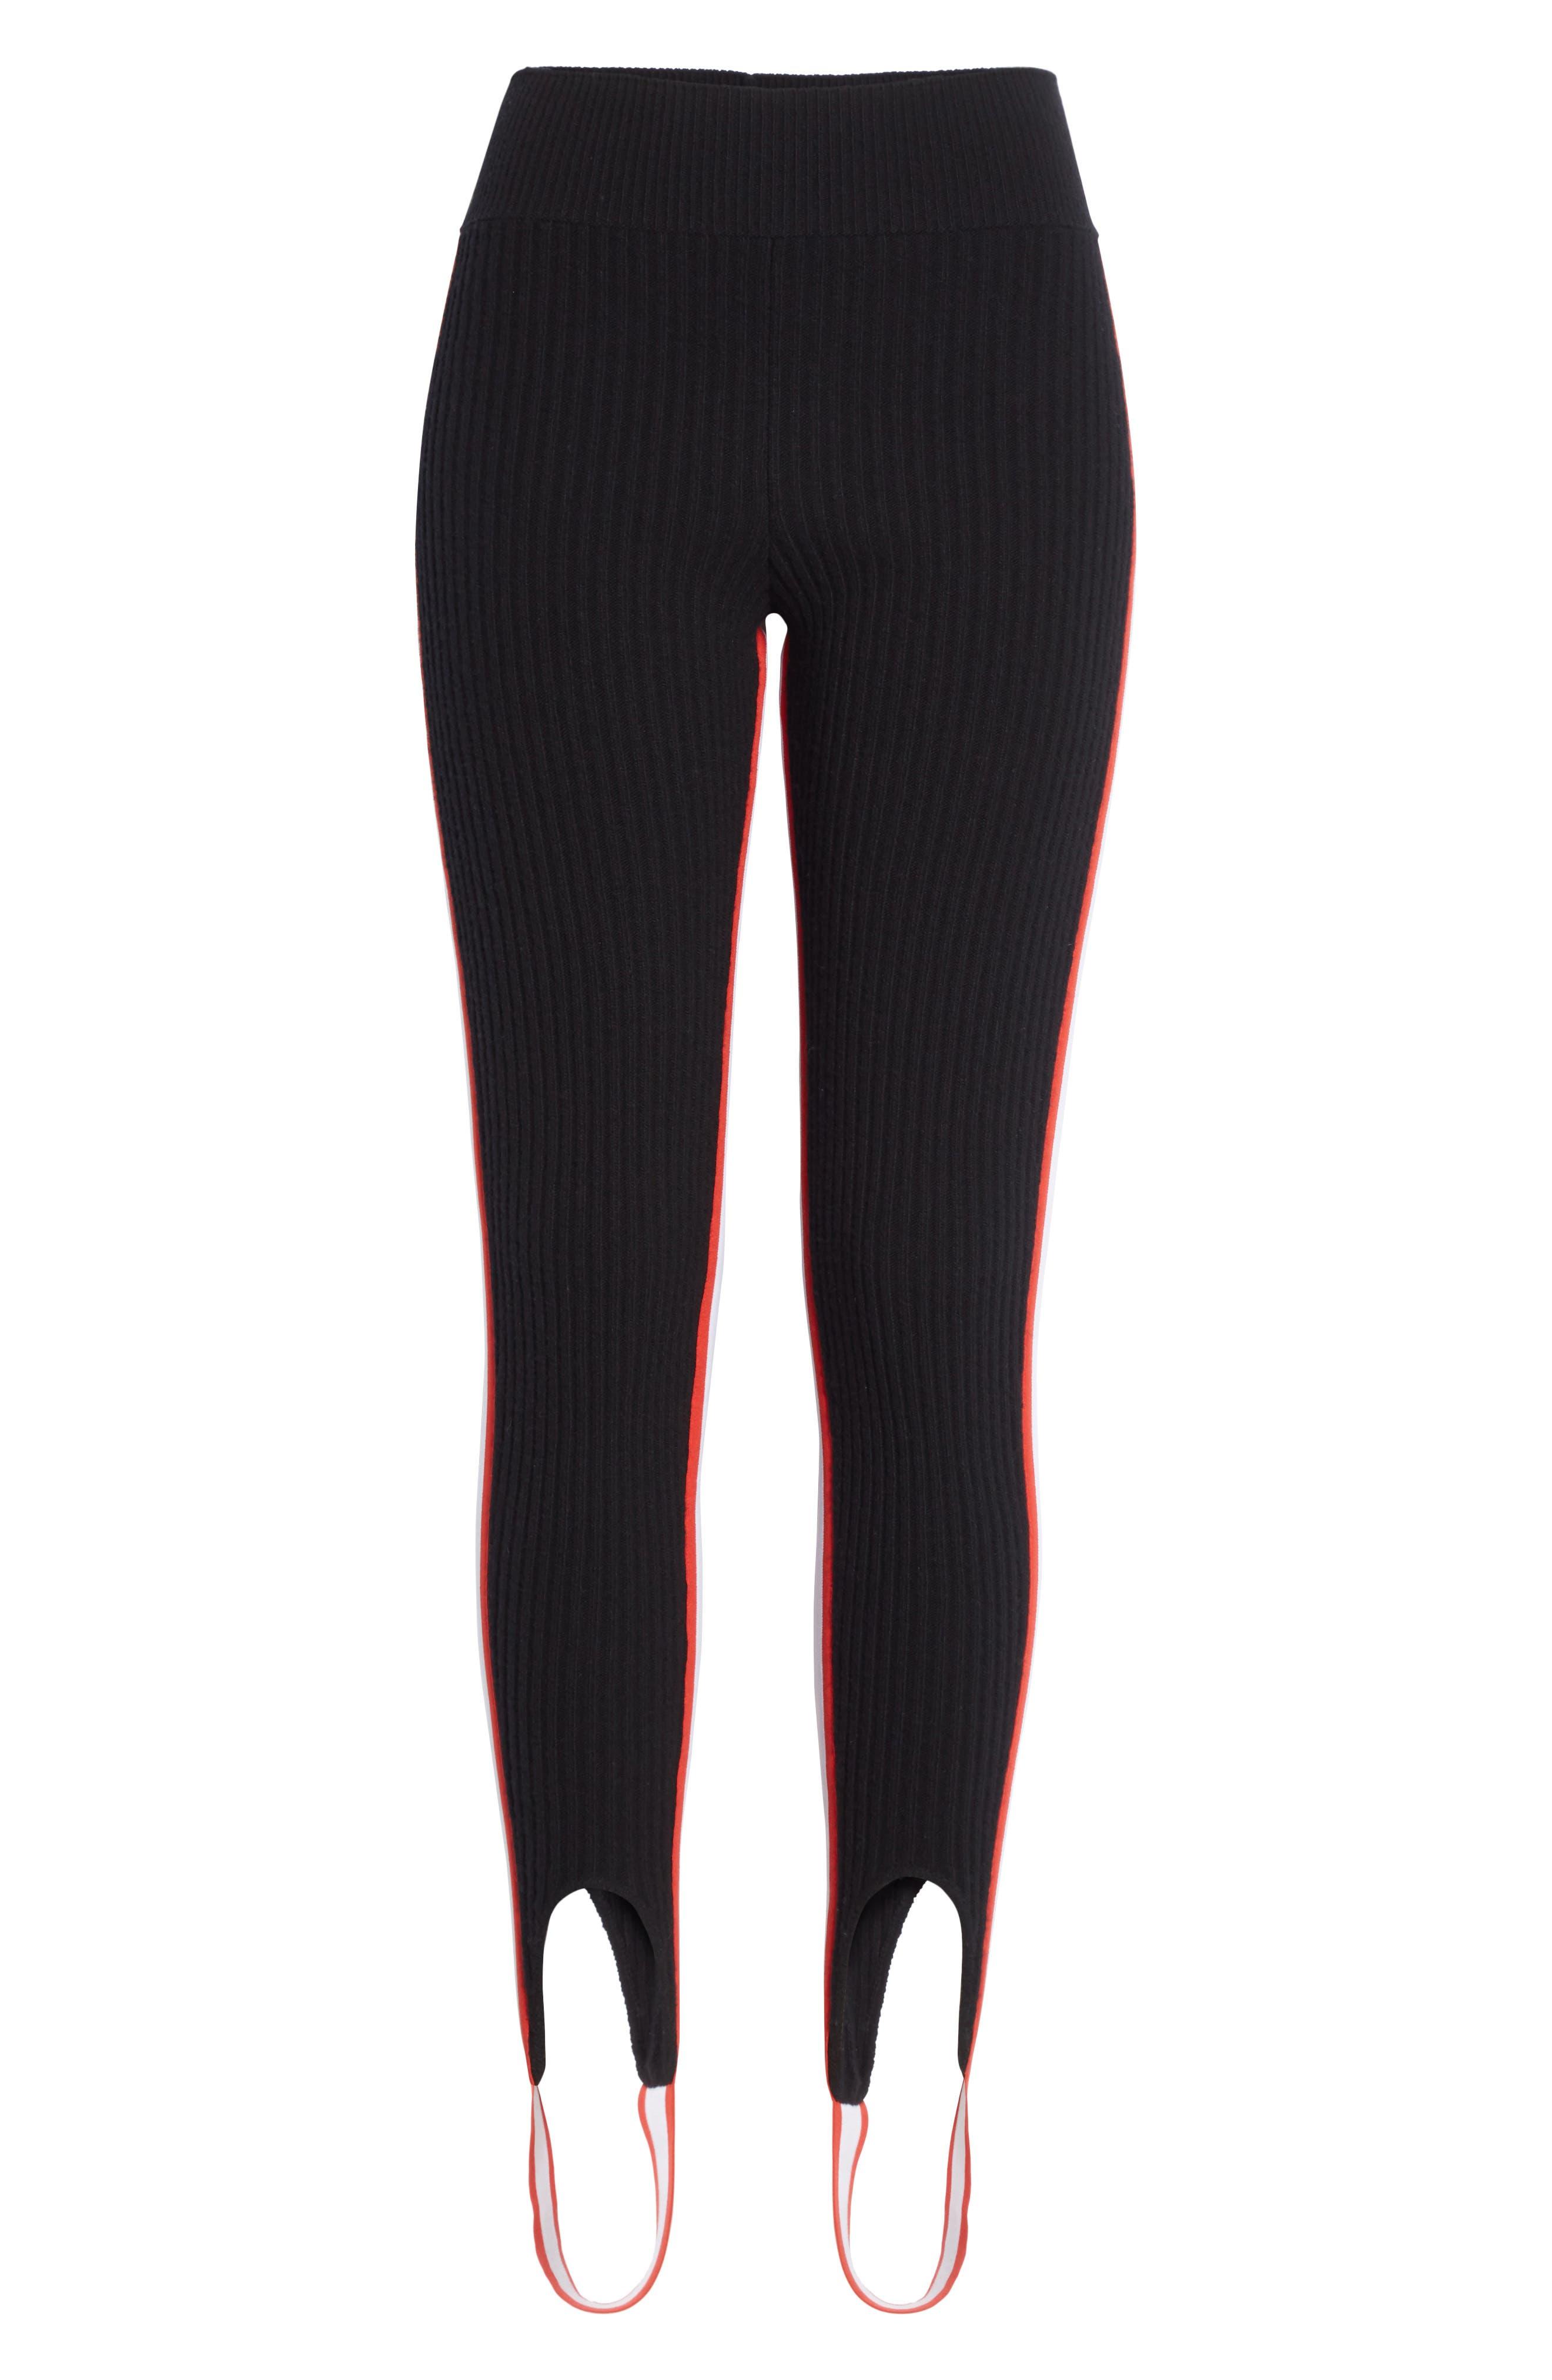 CALVIN KLEIN 205W39NYC,                             Side Stripe Stretch Wool Stirrup Leggings,                             Alternate thumbnail 6, color,                             001